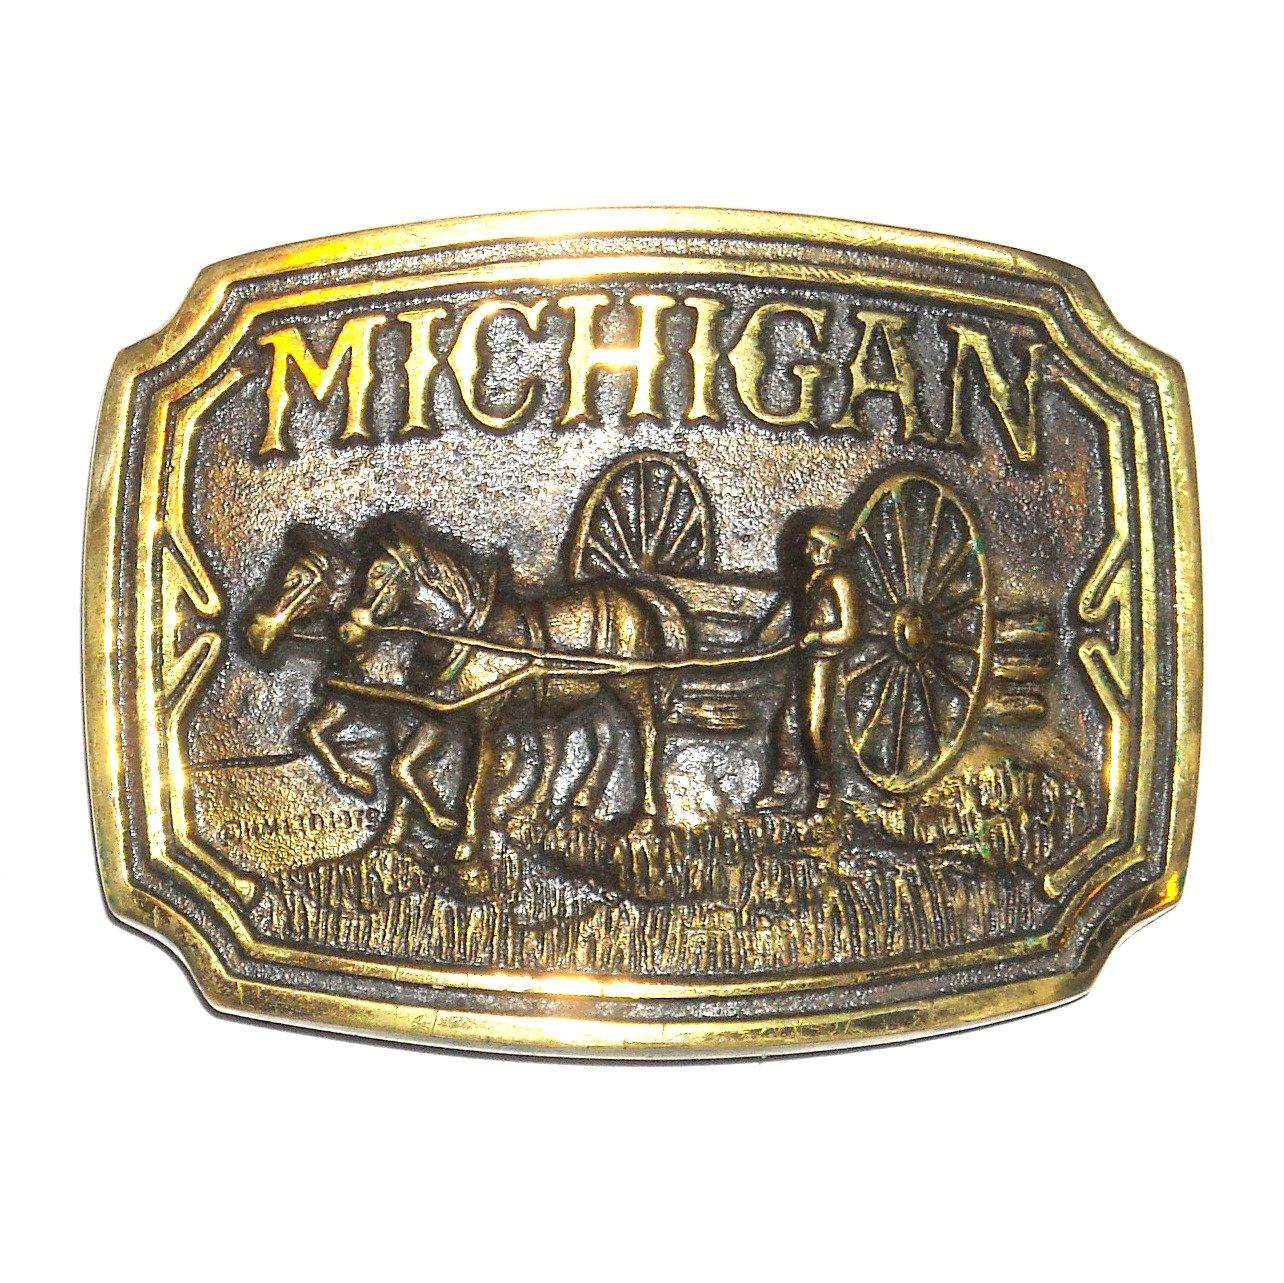 Michigan 3D Vintage Limited Edition 3055 Heritage Mint Belt Buckle